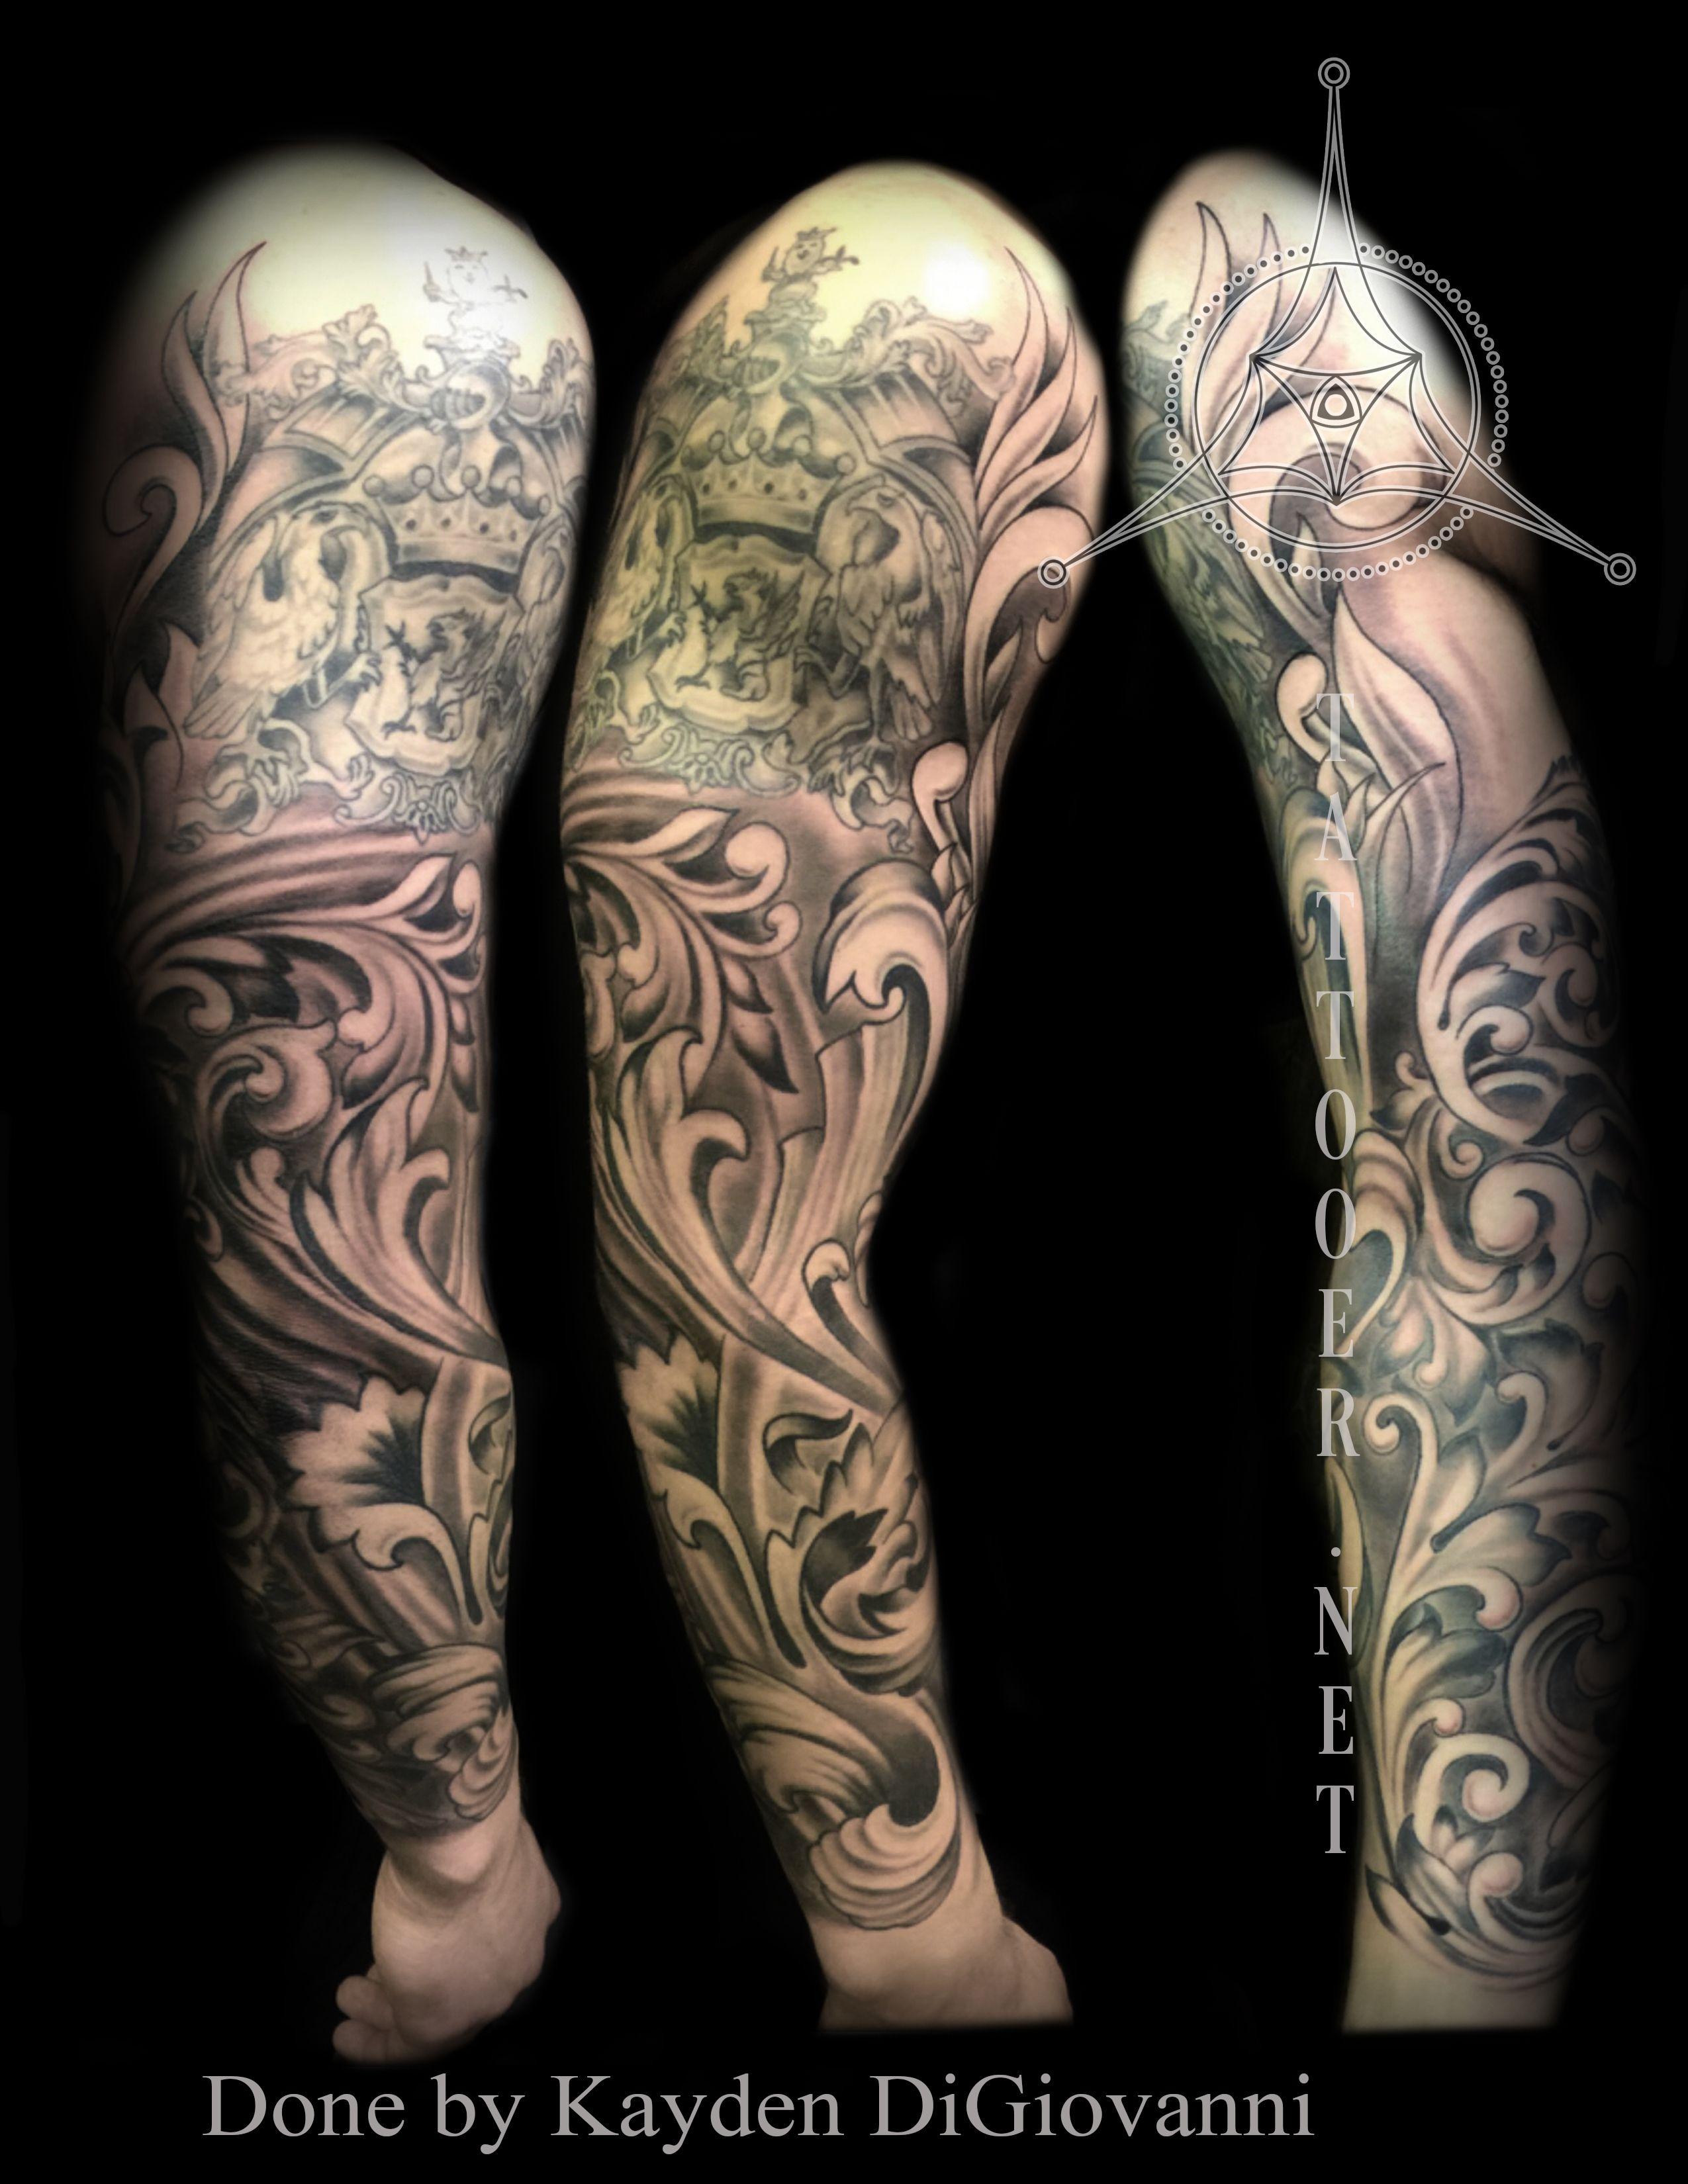 Pin By Dallas Tattoo On Dallas Tattoo Dallas Tattoo Denver Tattoo Artists Tattoos